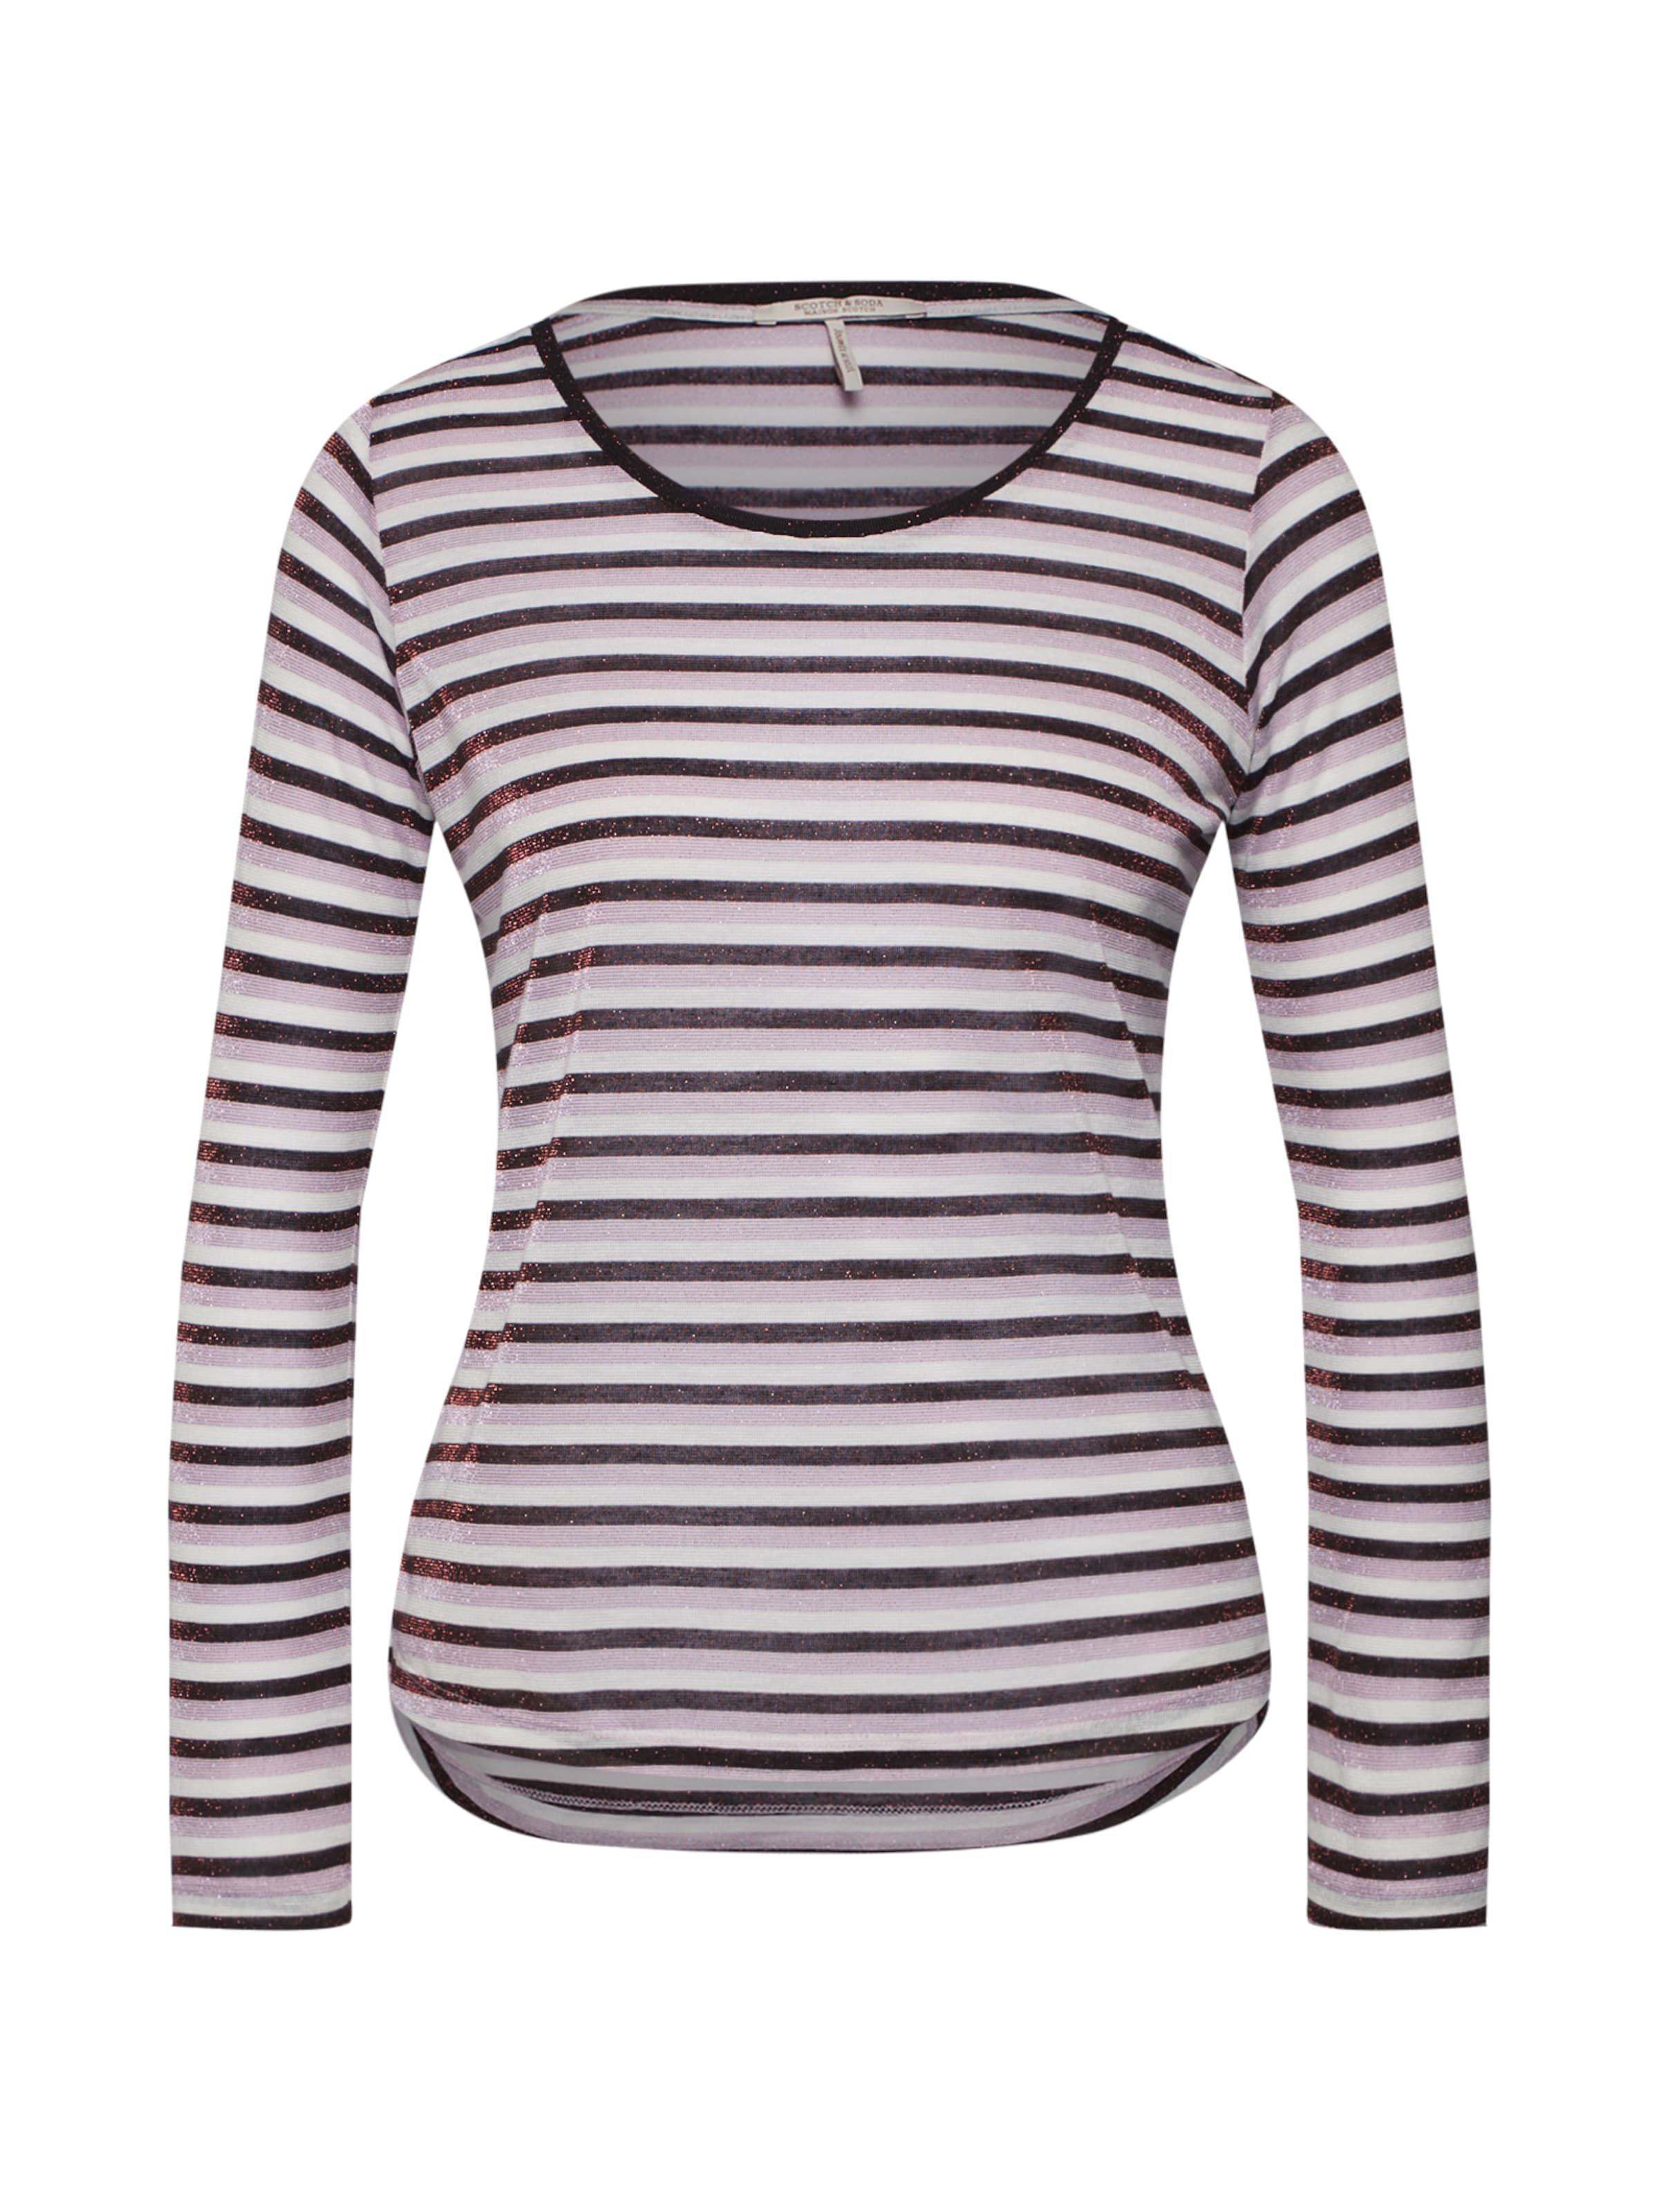 shirt En Soda LavandeBourgogne Blanc T Scotchamp; TwkPiuOZX